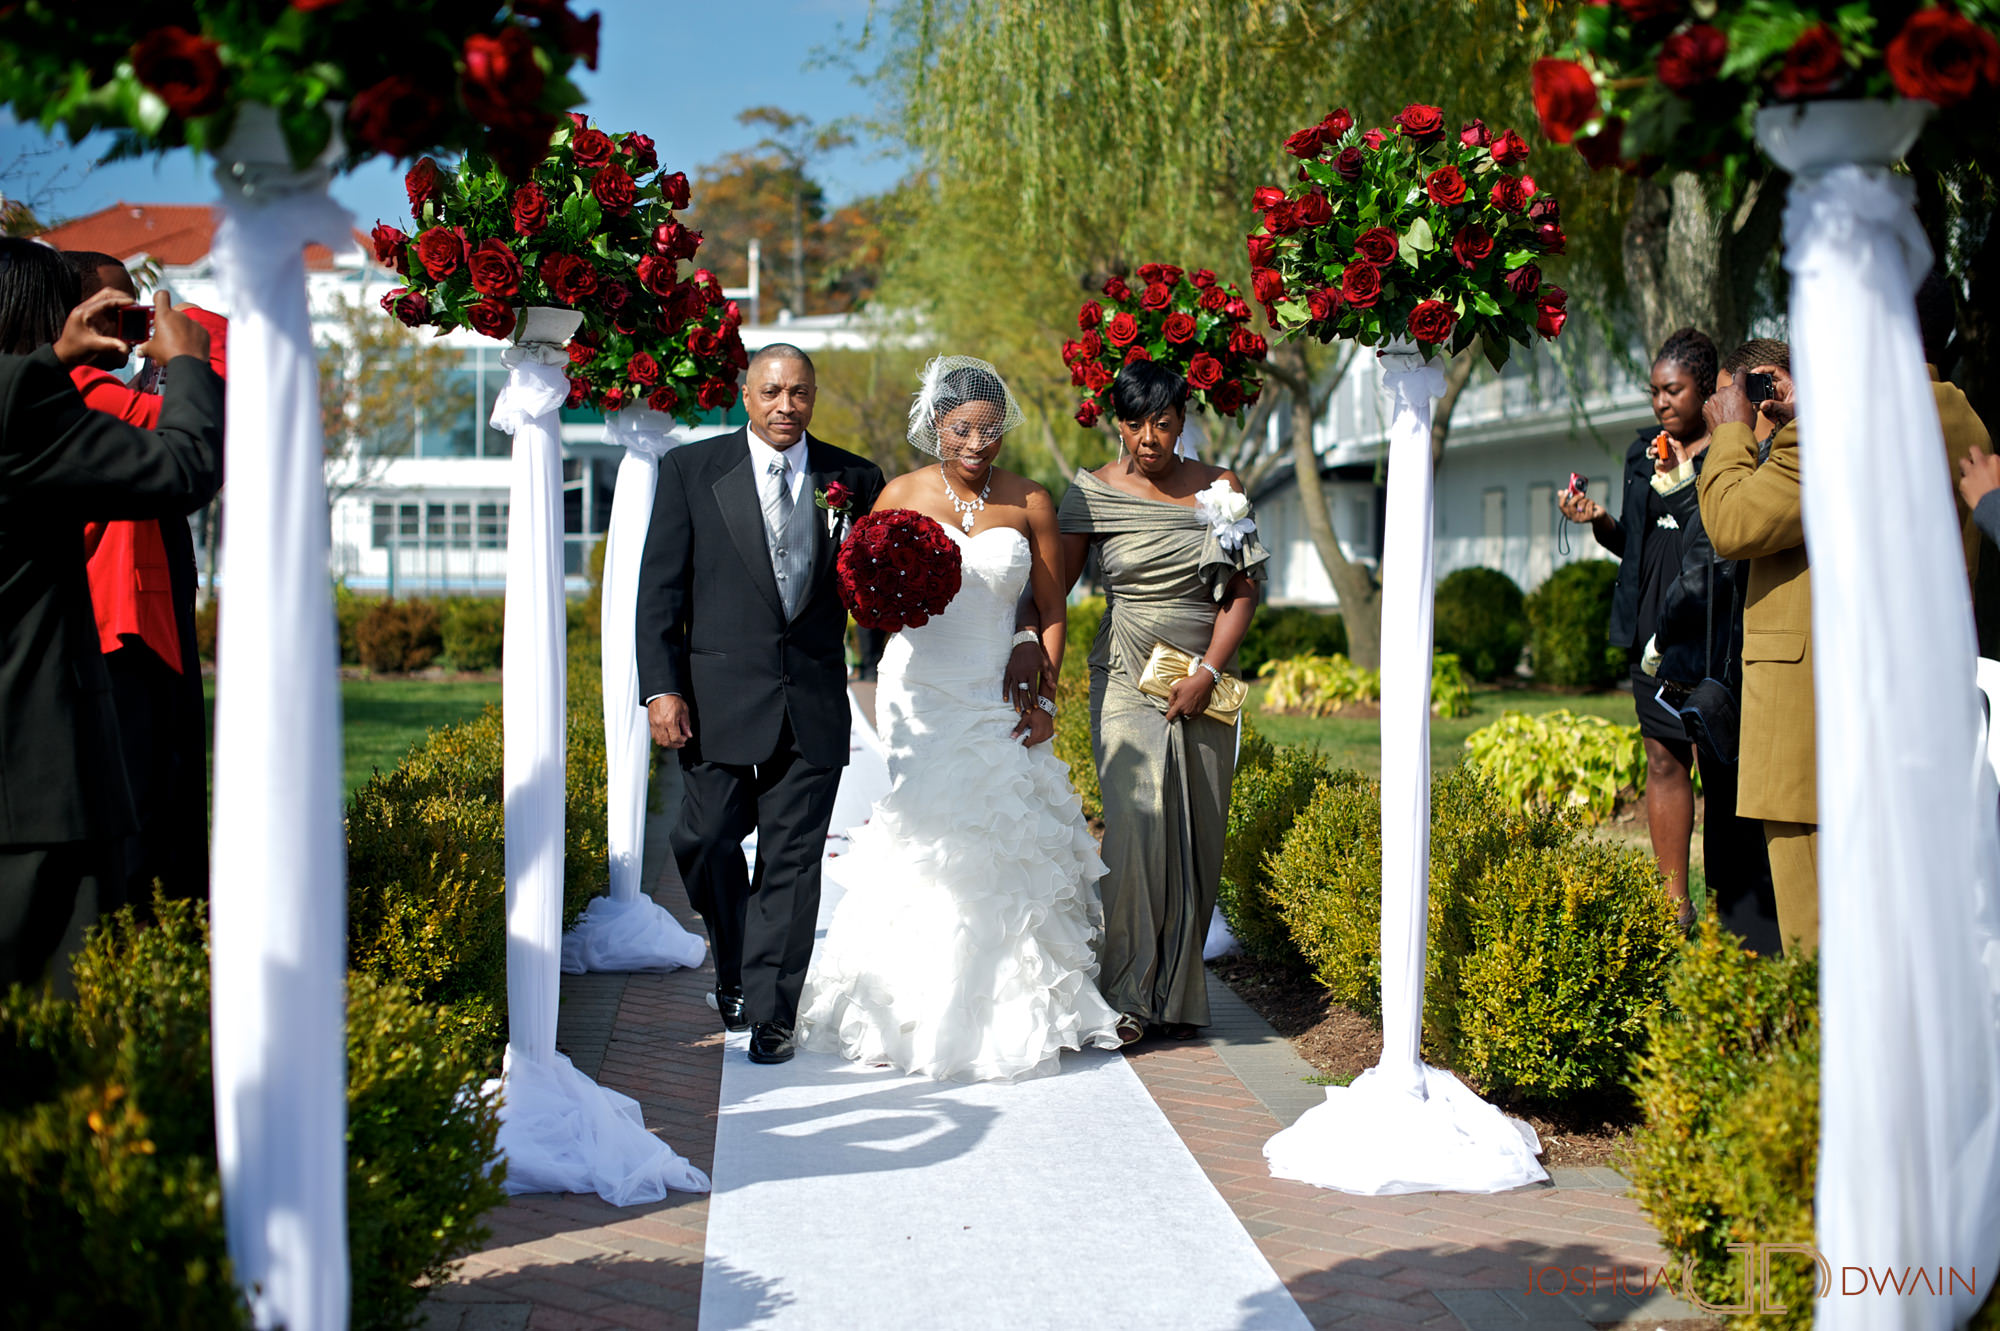 natifia-don-008-greentree-country-clubnew-rochelle-new-york-wedding-photographer-joshua-dwain-20101023_dn_0345